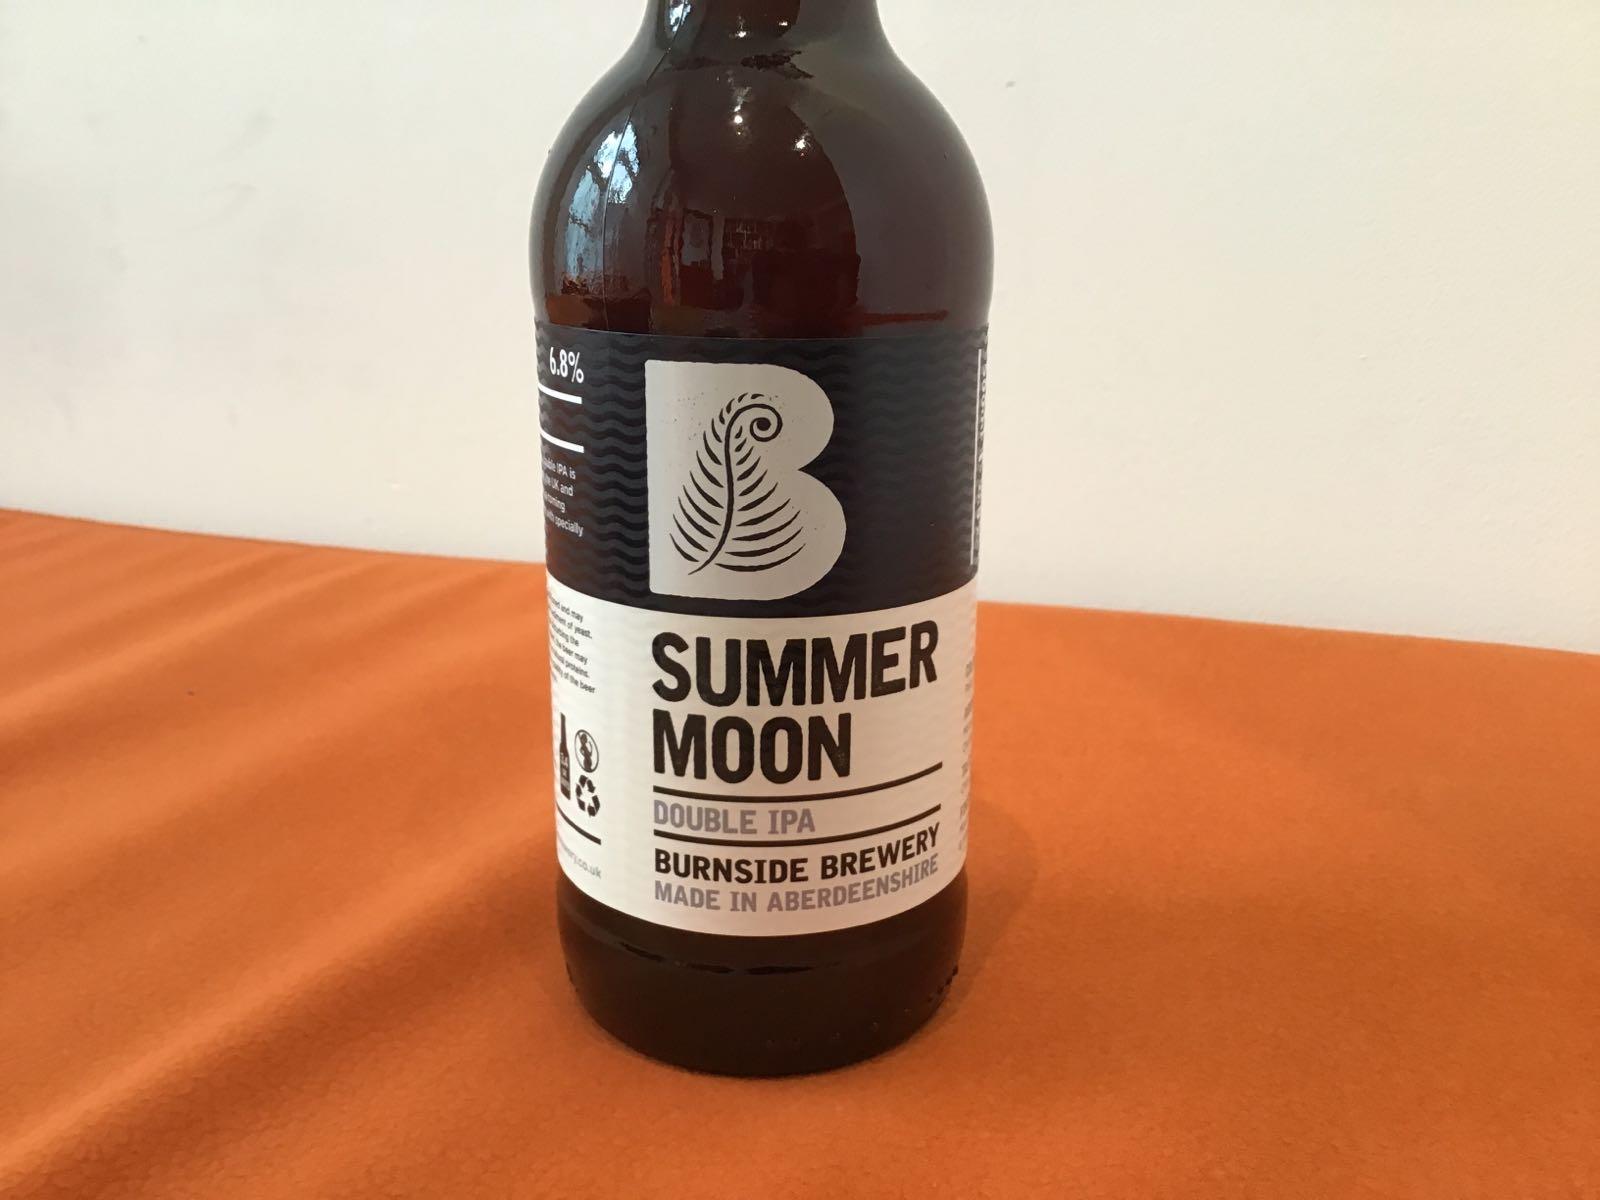 Burnside Brewery: Summer Moon